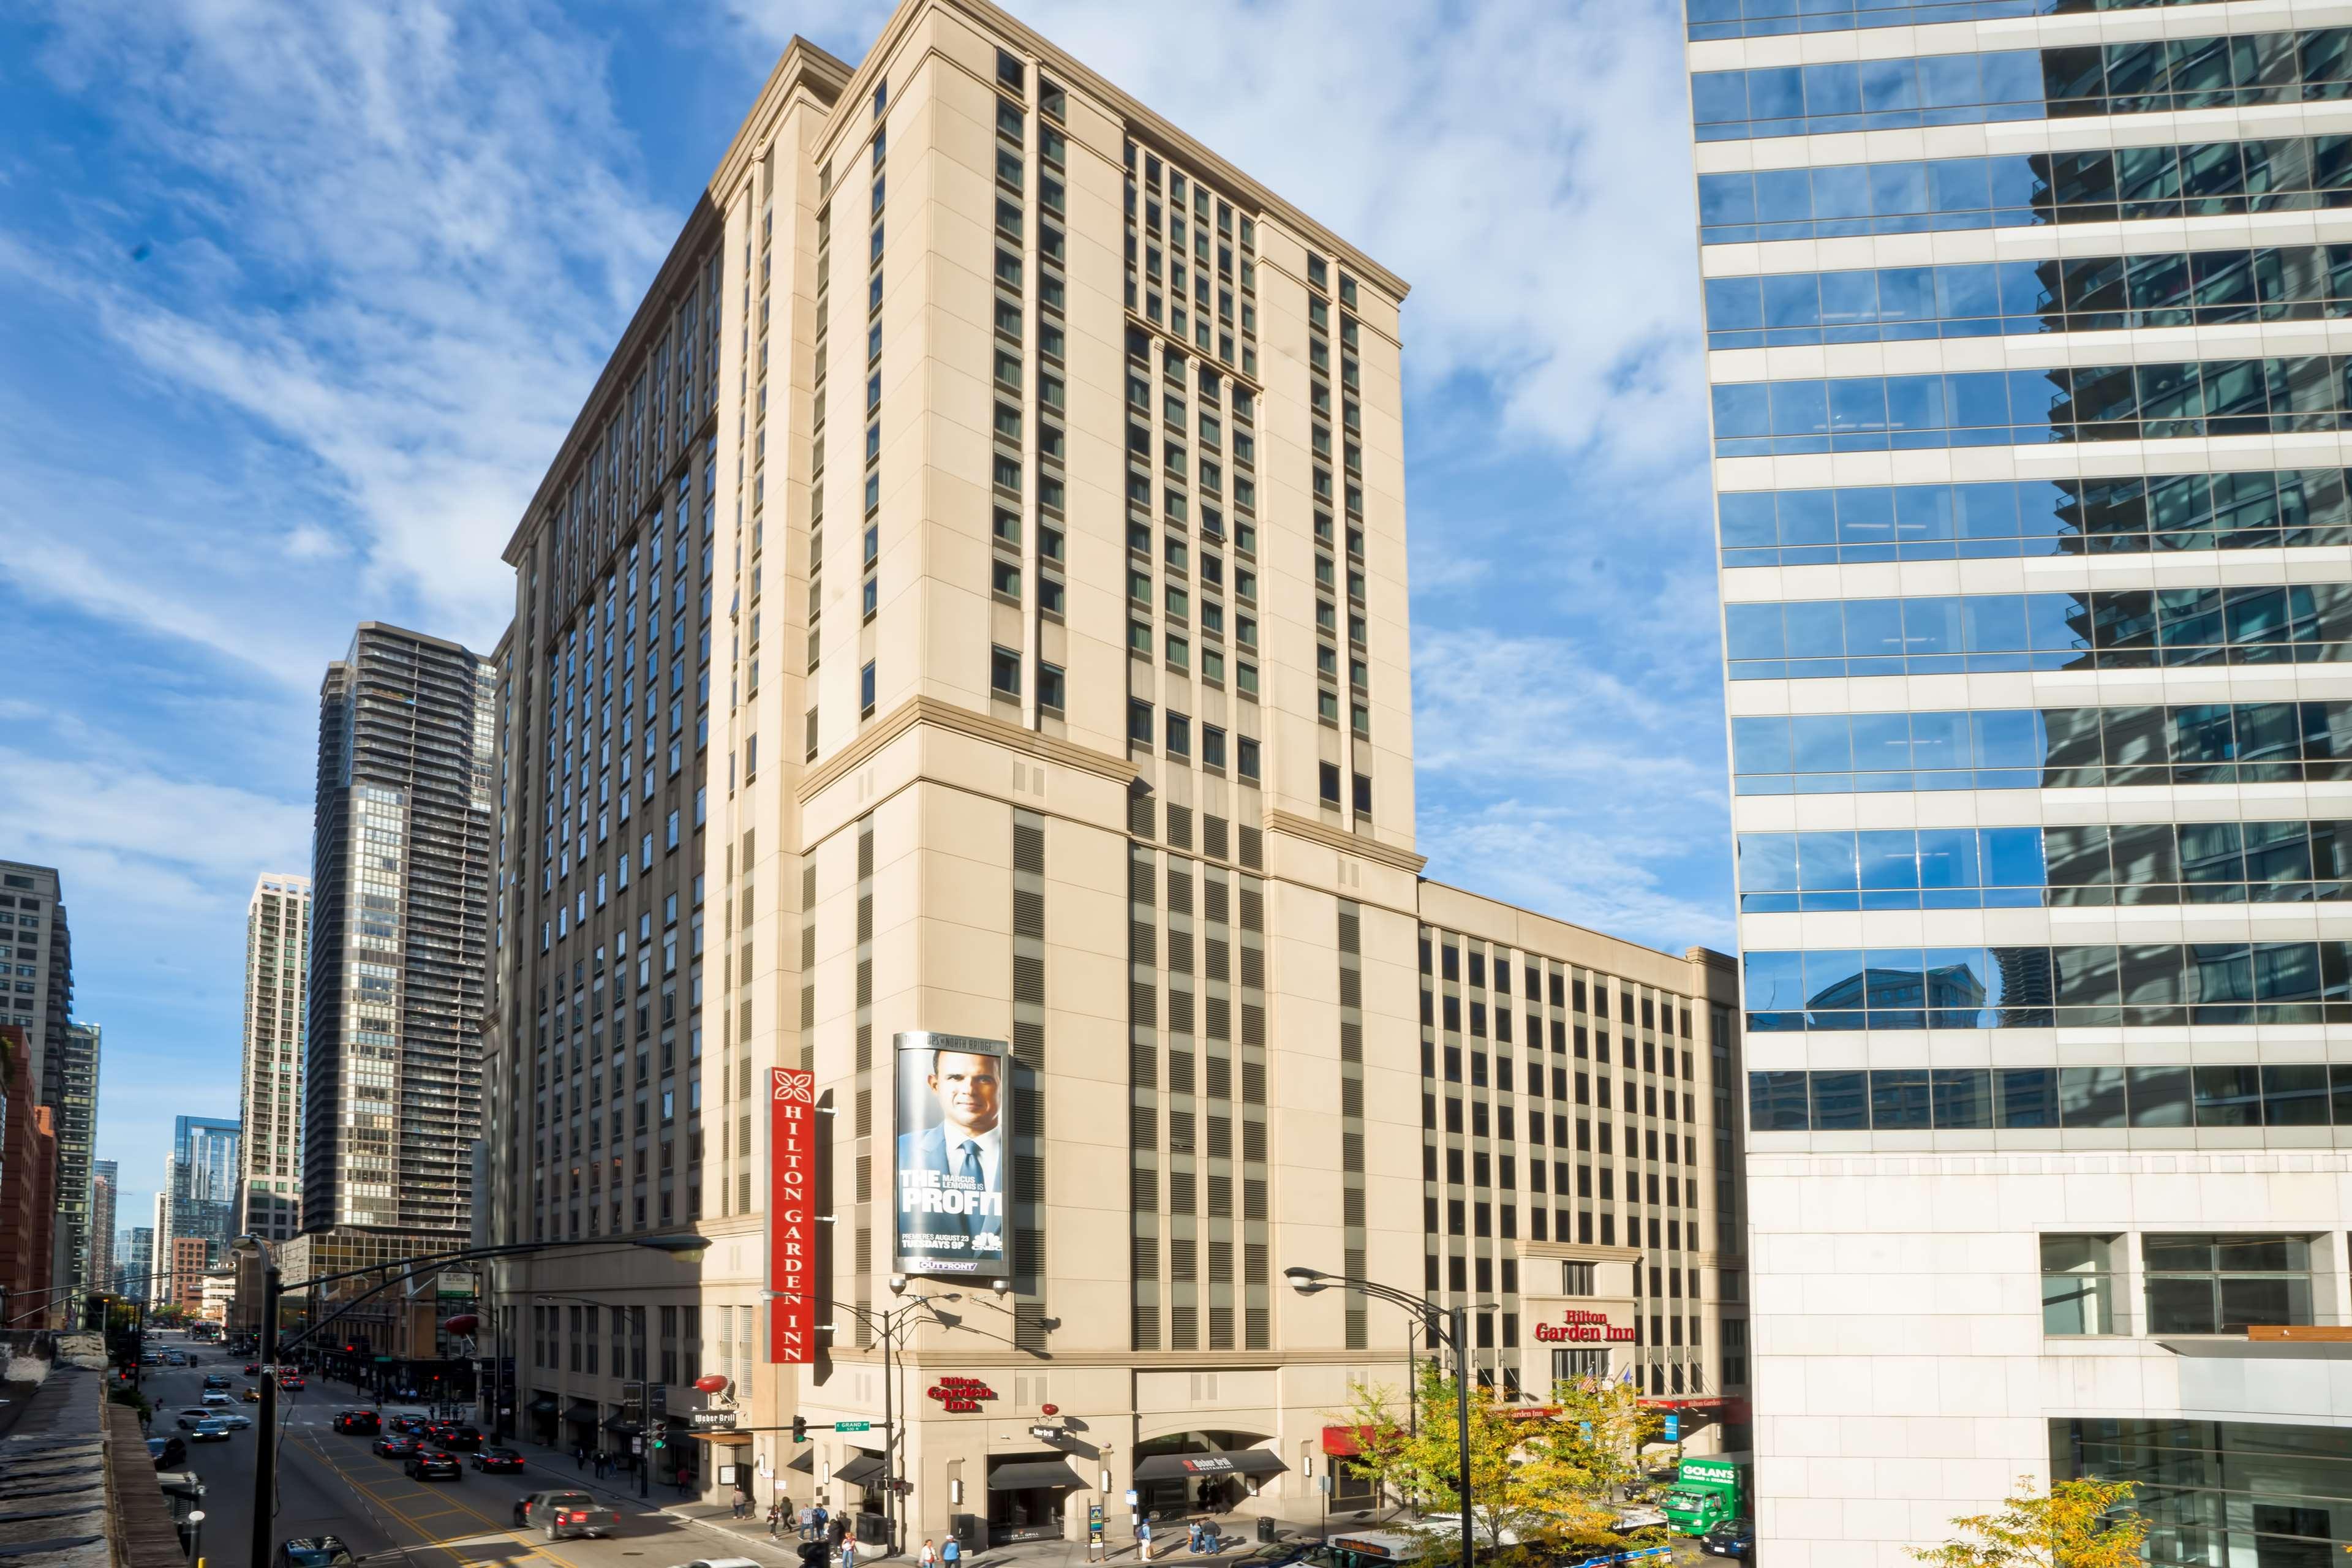 Hilton Garden Inn Chicago Downtown/Magnificent Mile image 3